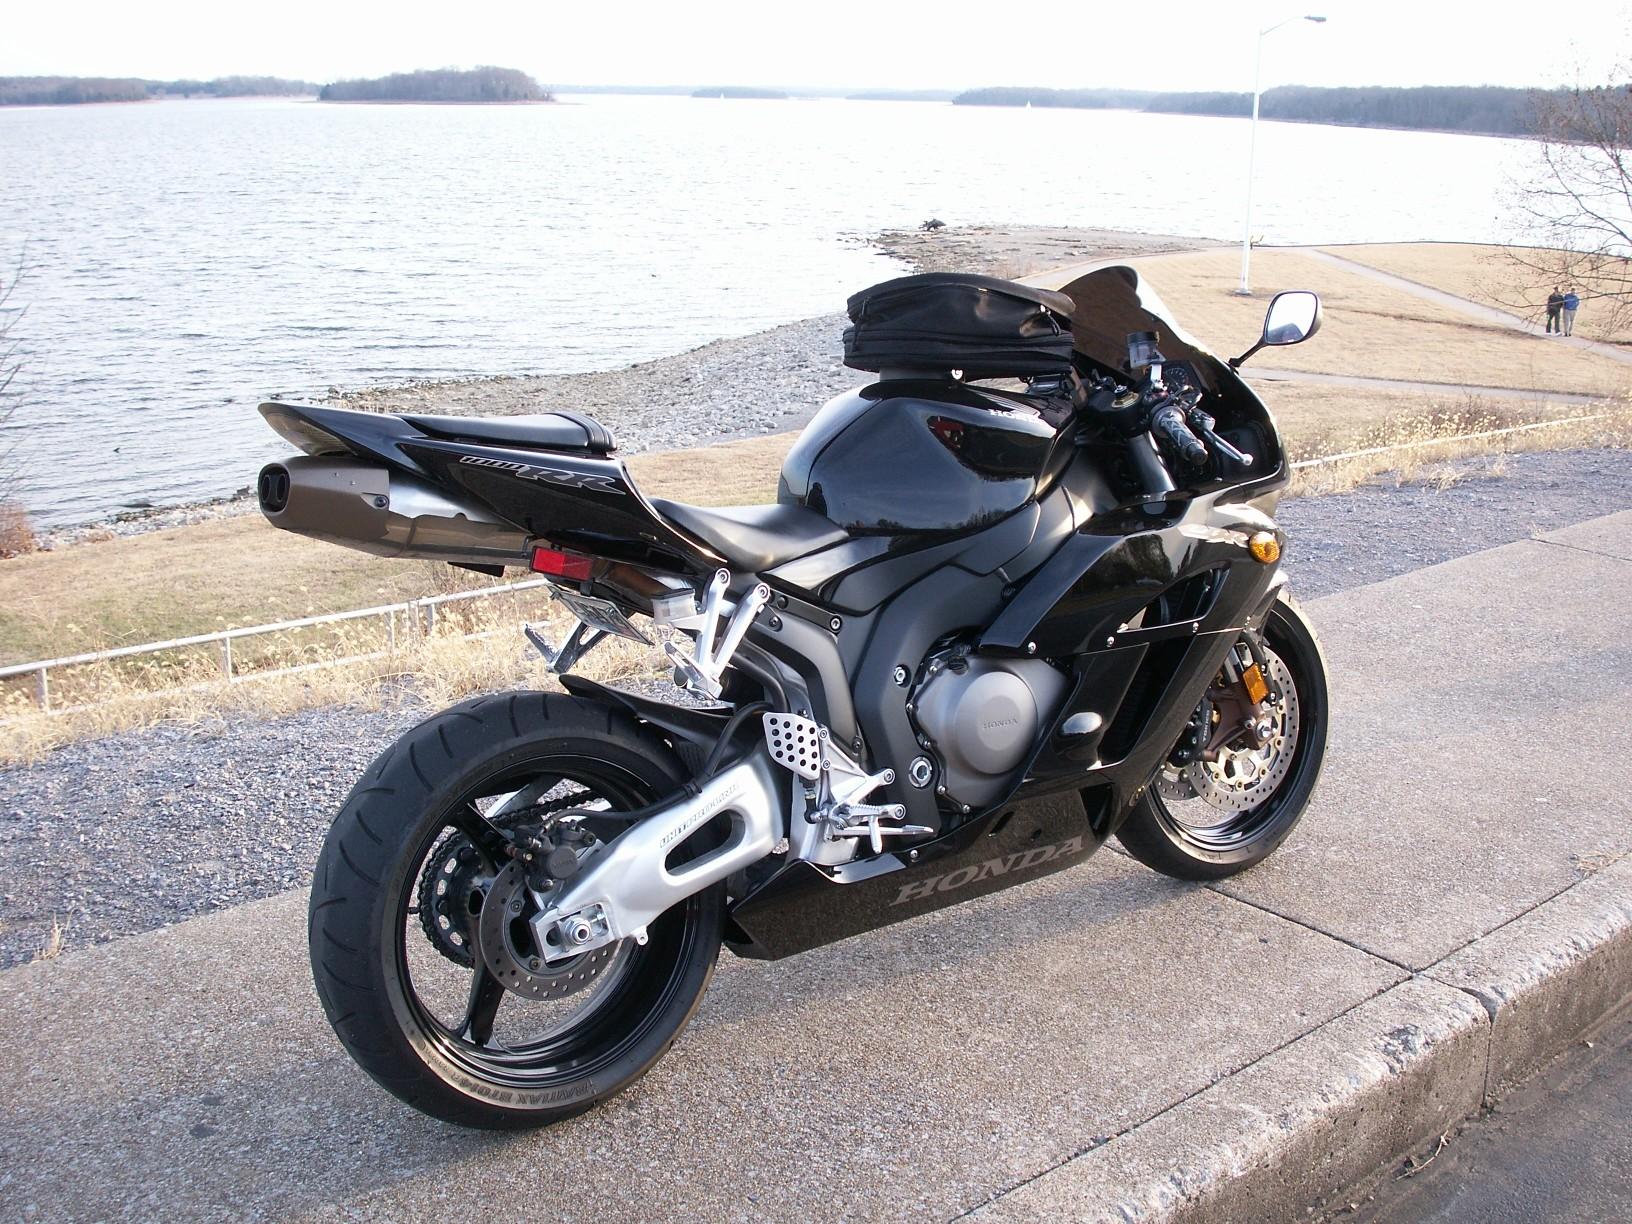 for sale..2004 honda 1000rr $8000.00 nashville tn - sportbikes